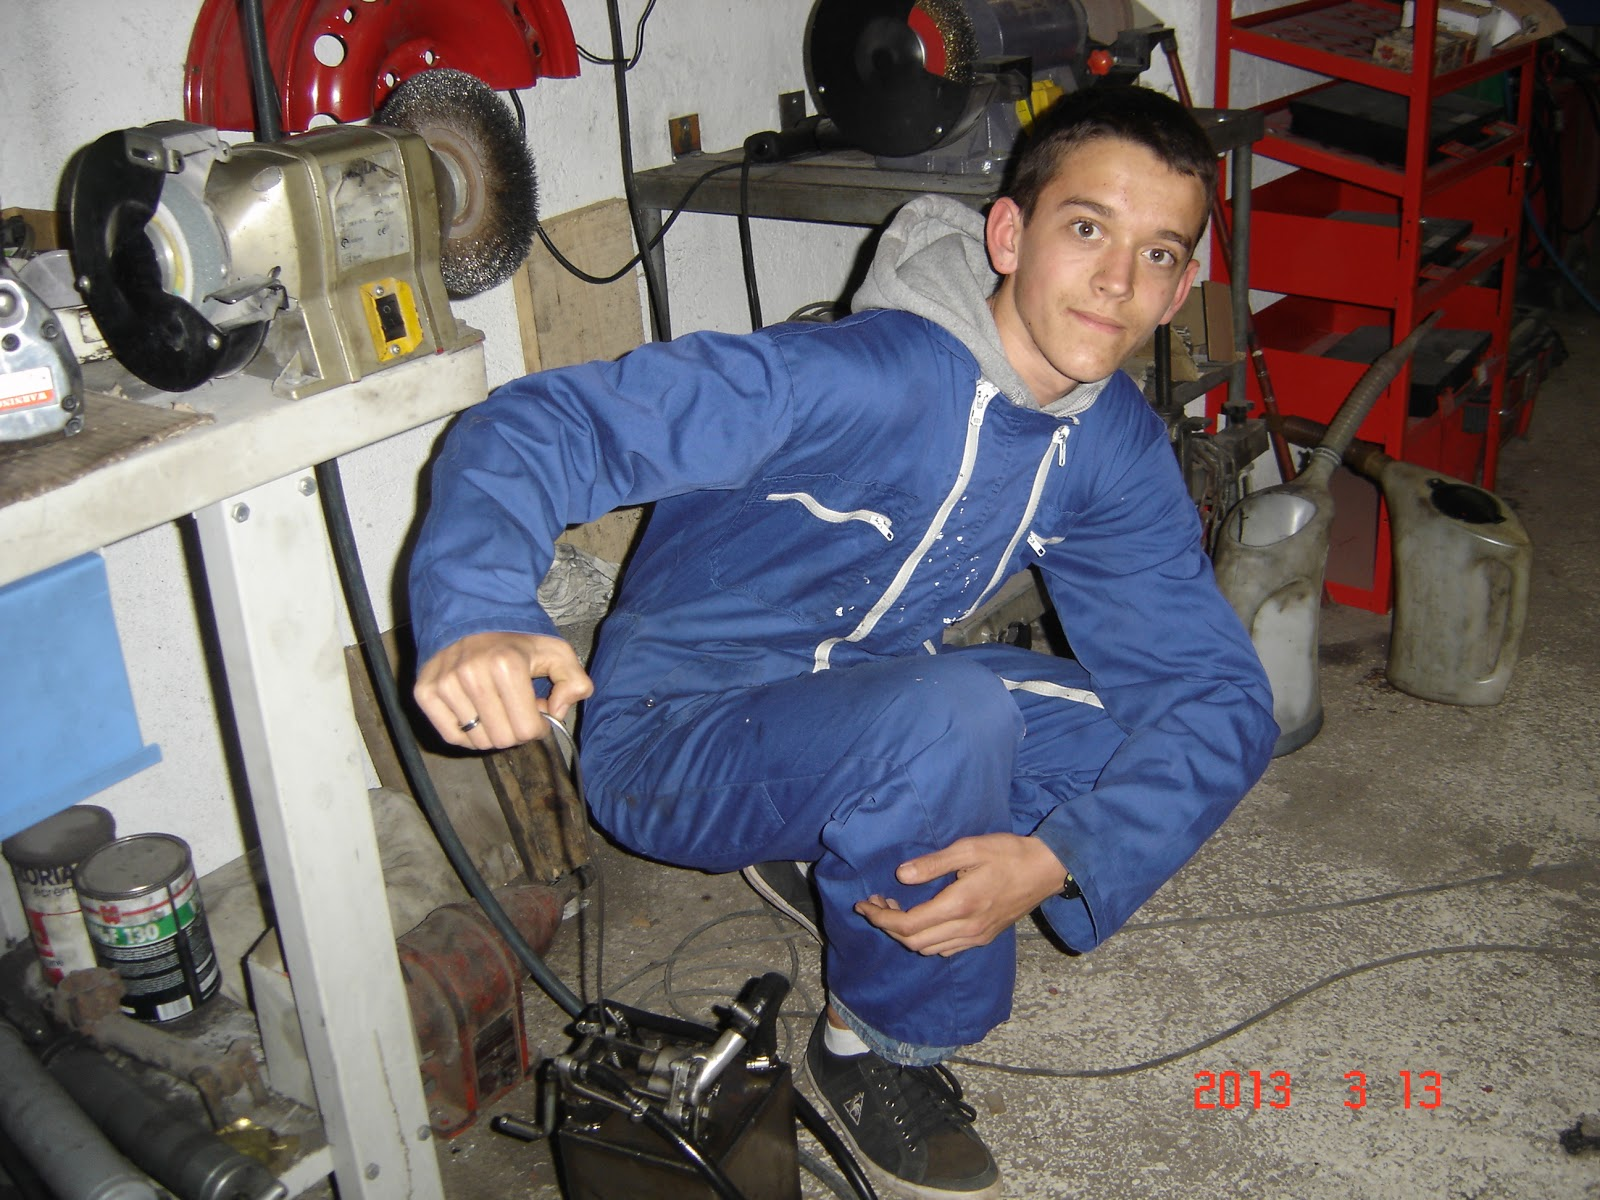 Isja ulis brignoles 83 stages lyc ens 2013 for Garage 83 brignoles